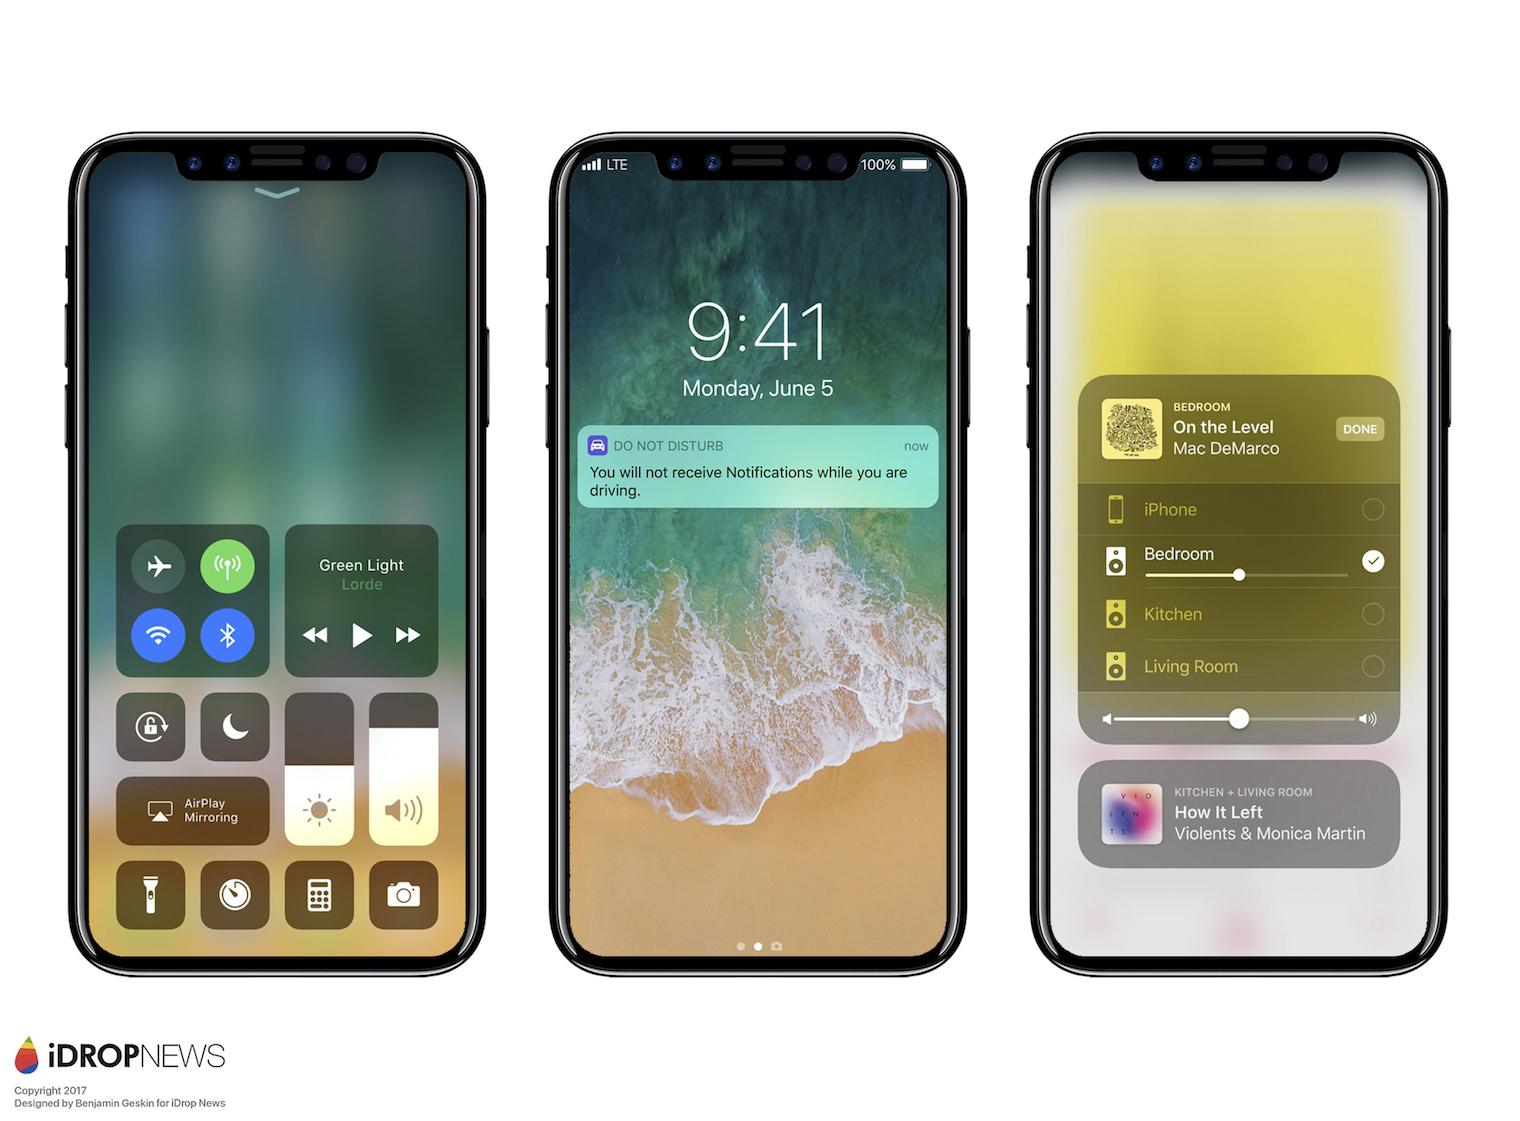 iPhone-X-iDrop-News-1